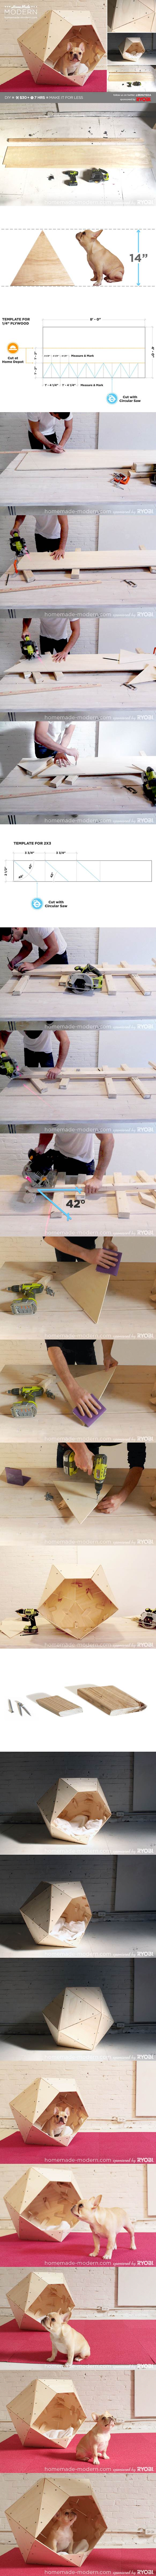 DIY Geometric Dog House 2